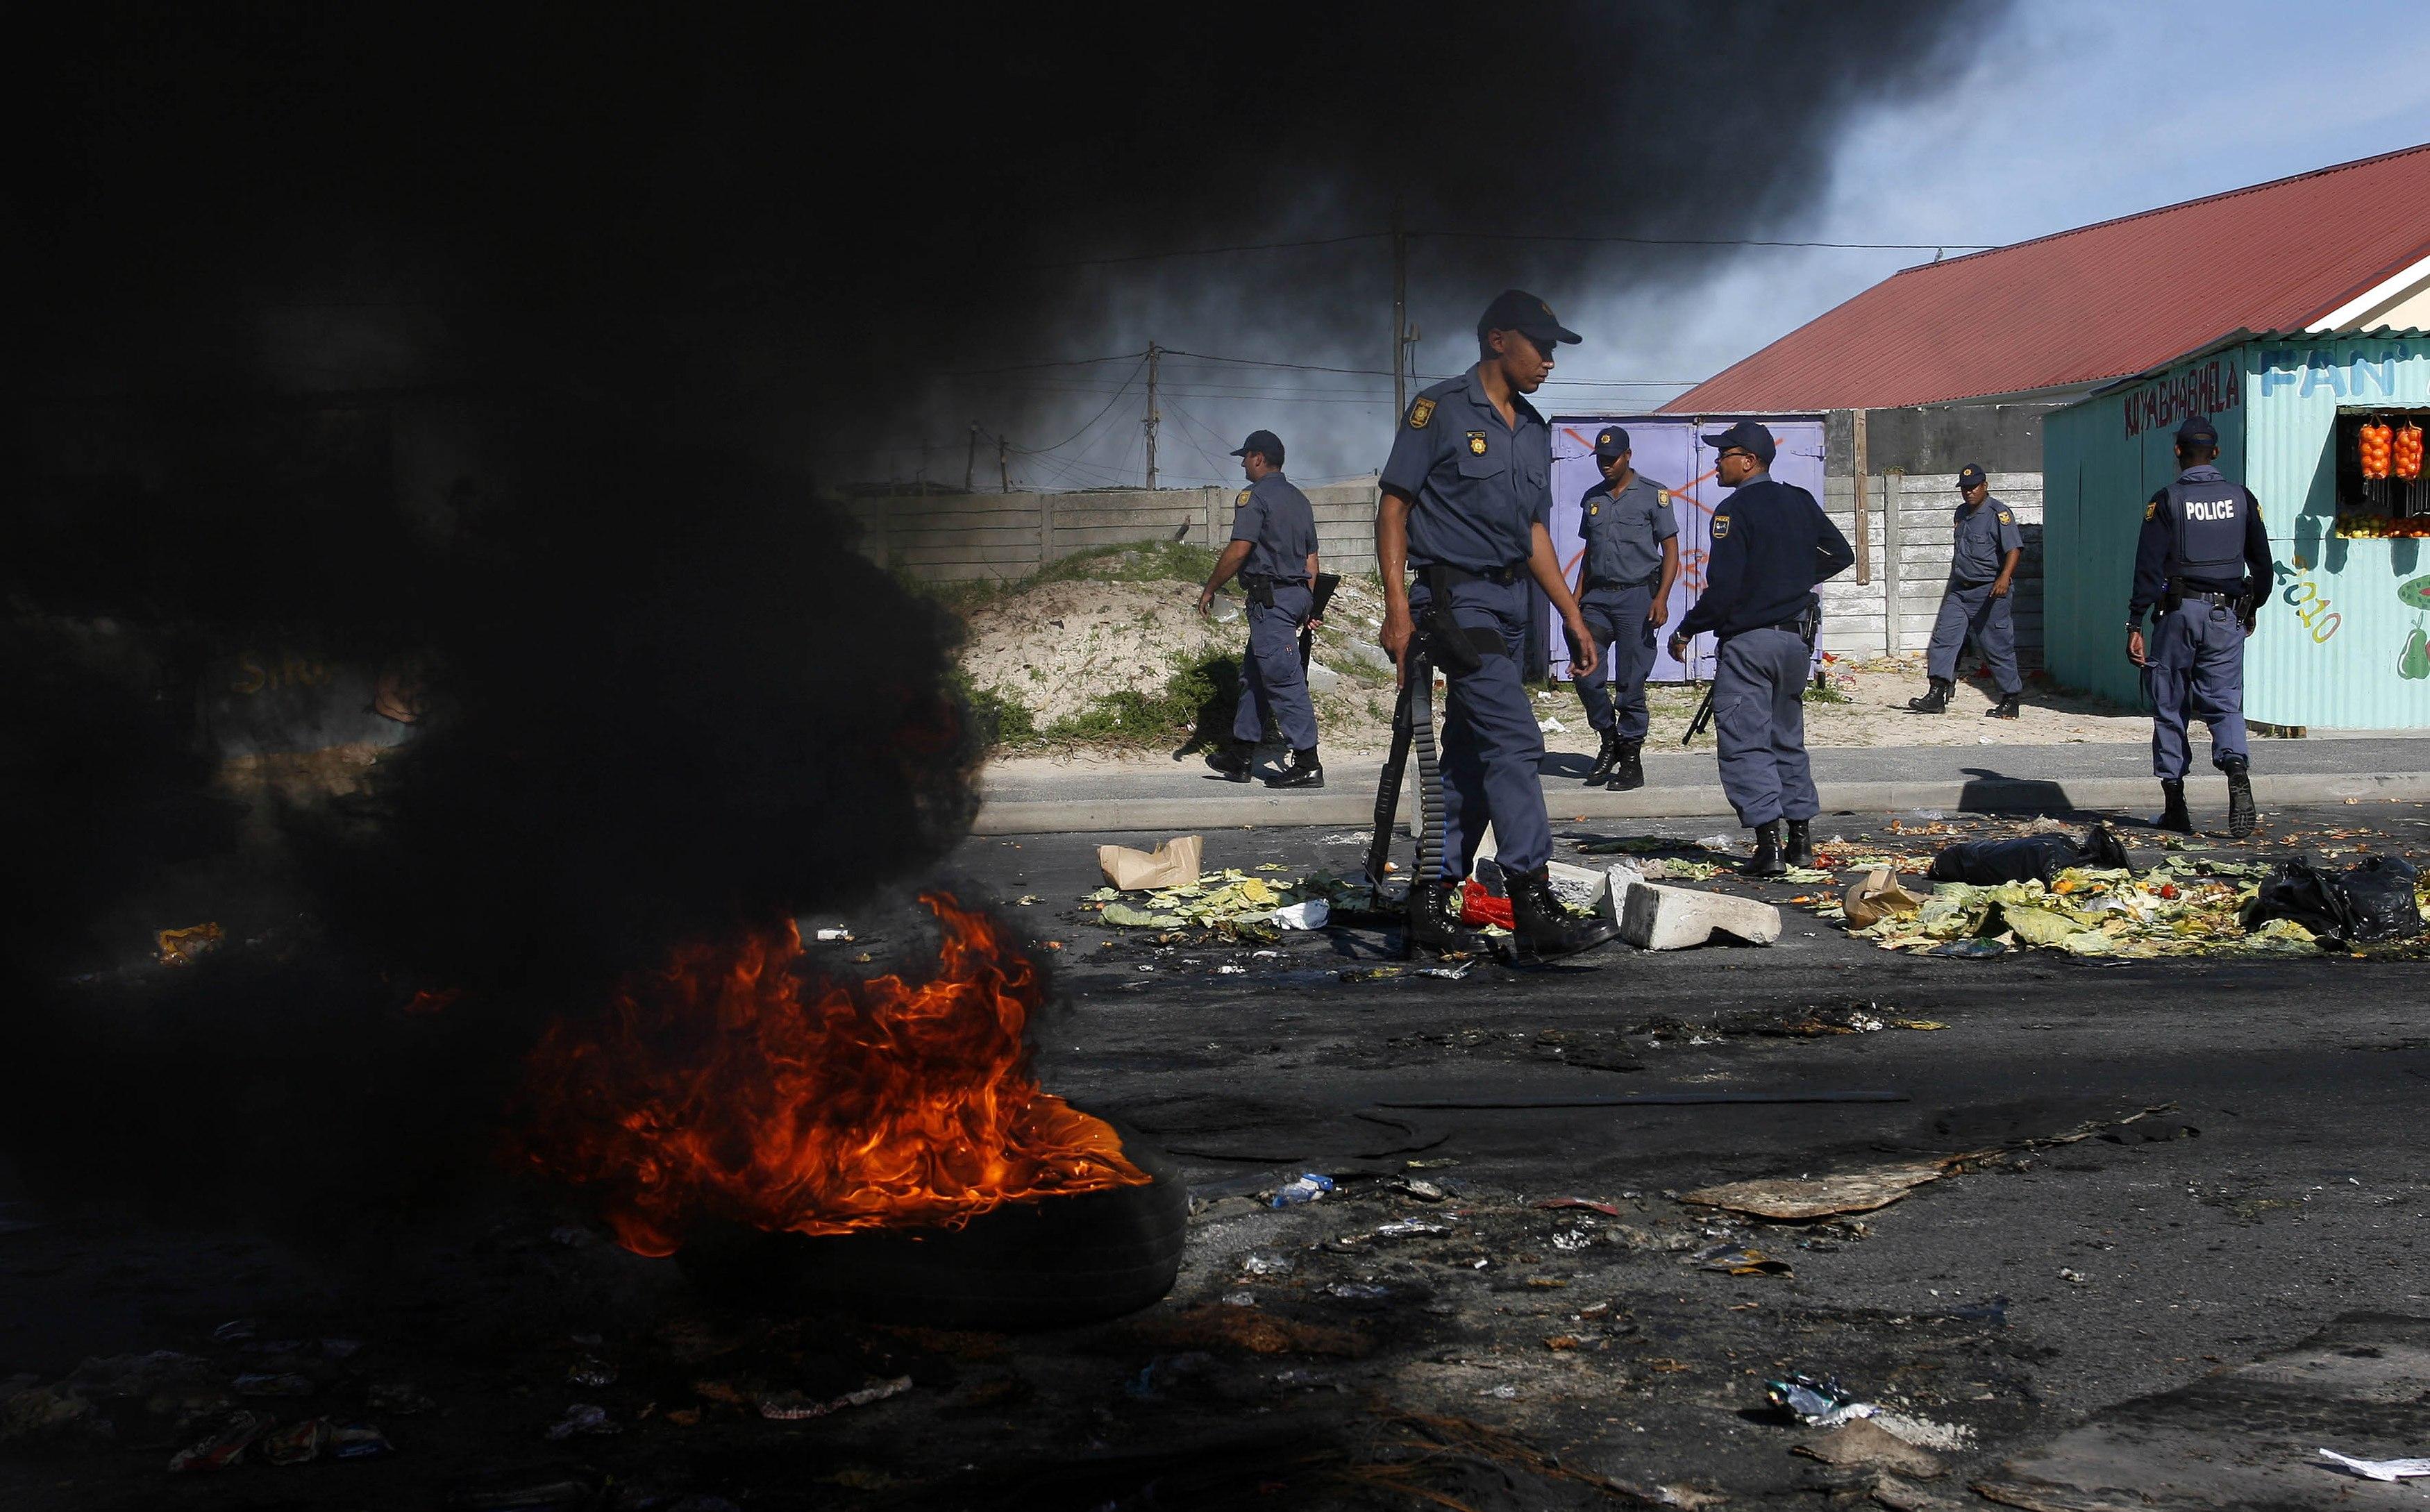 Police behind burning barricades.